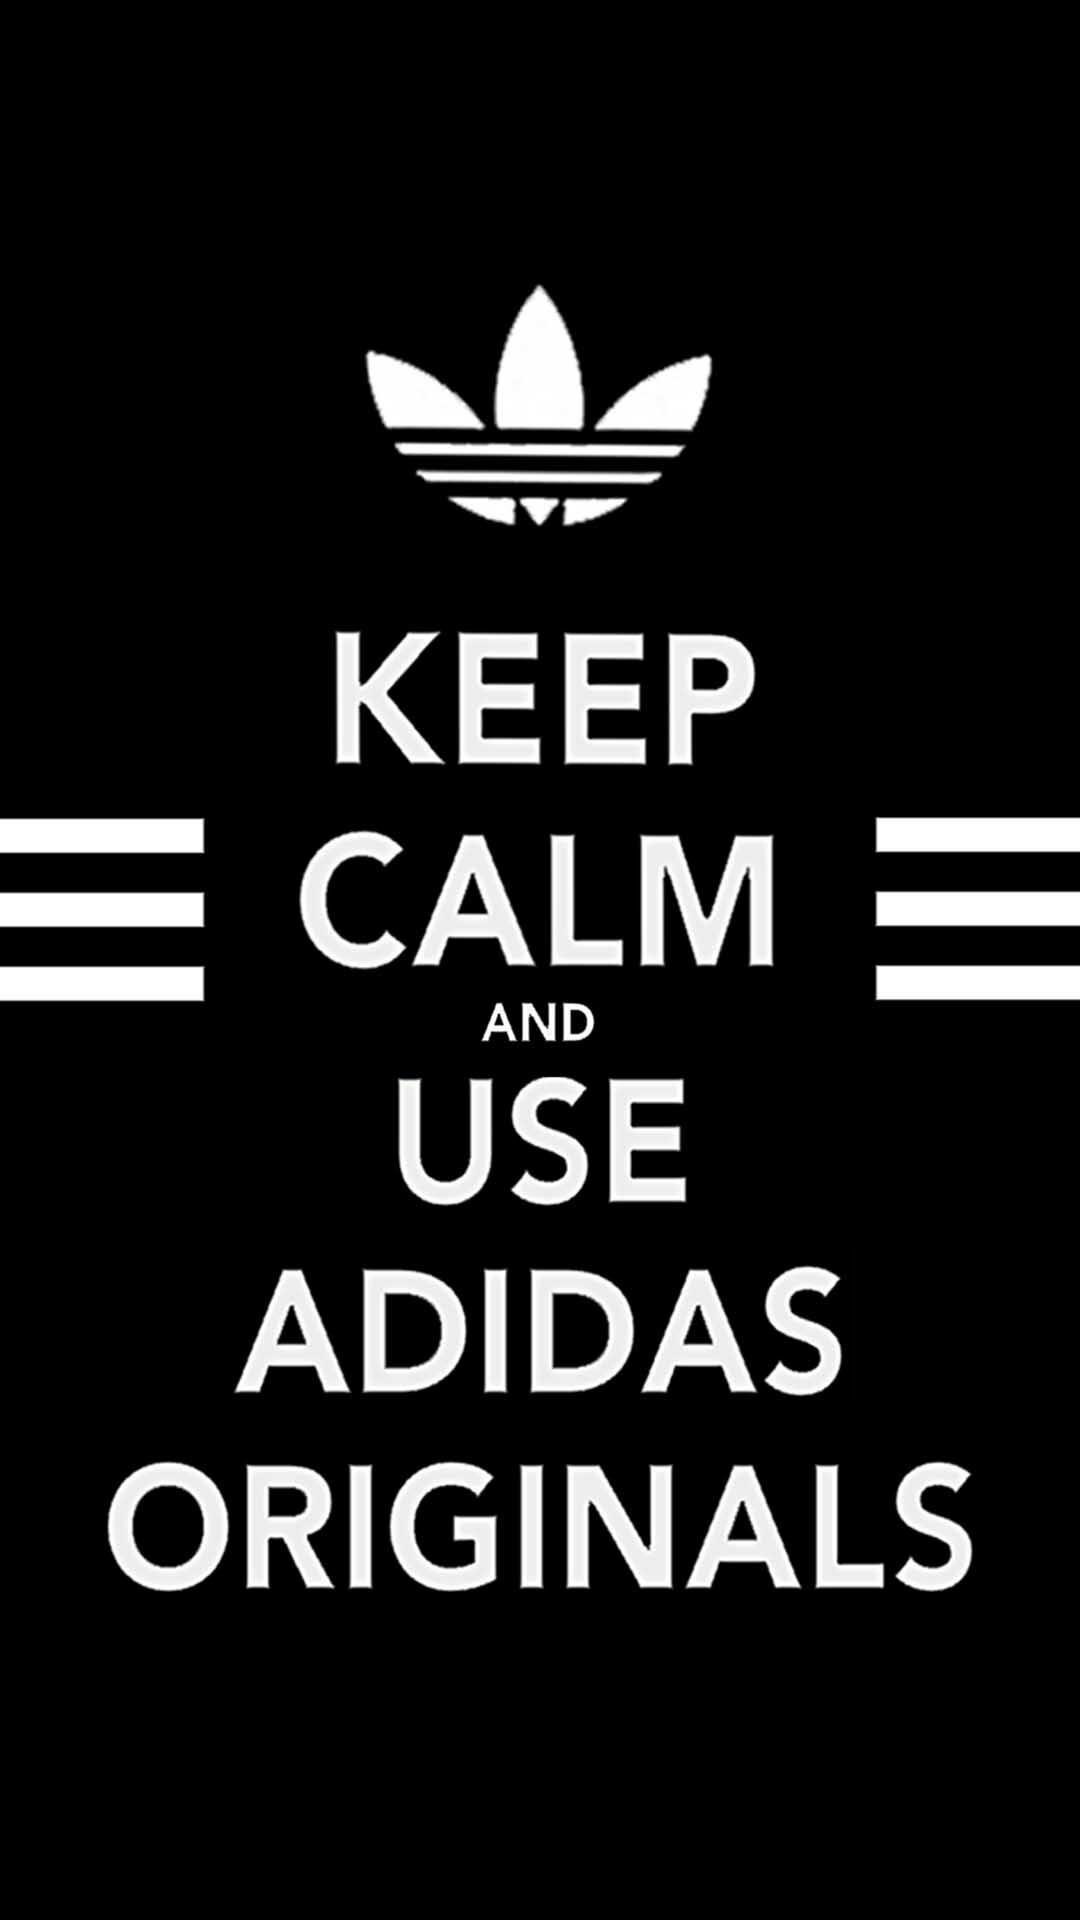 Jordan Logo 3d Wallpaper Adidas Logo Wallpaper 2018 71 Images